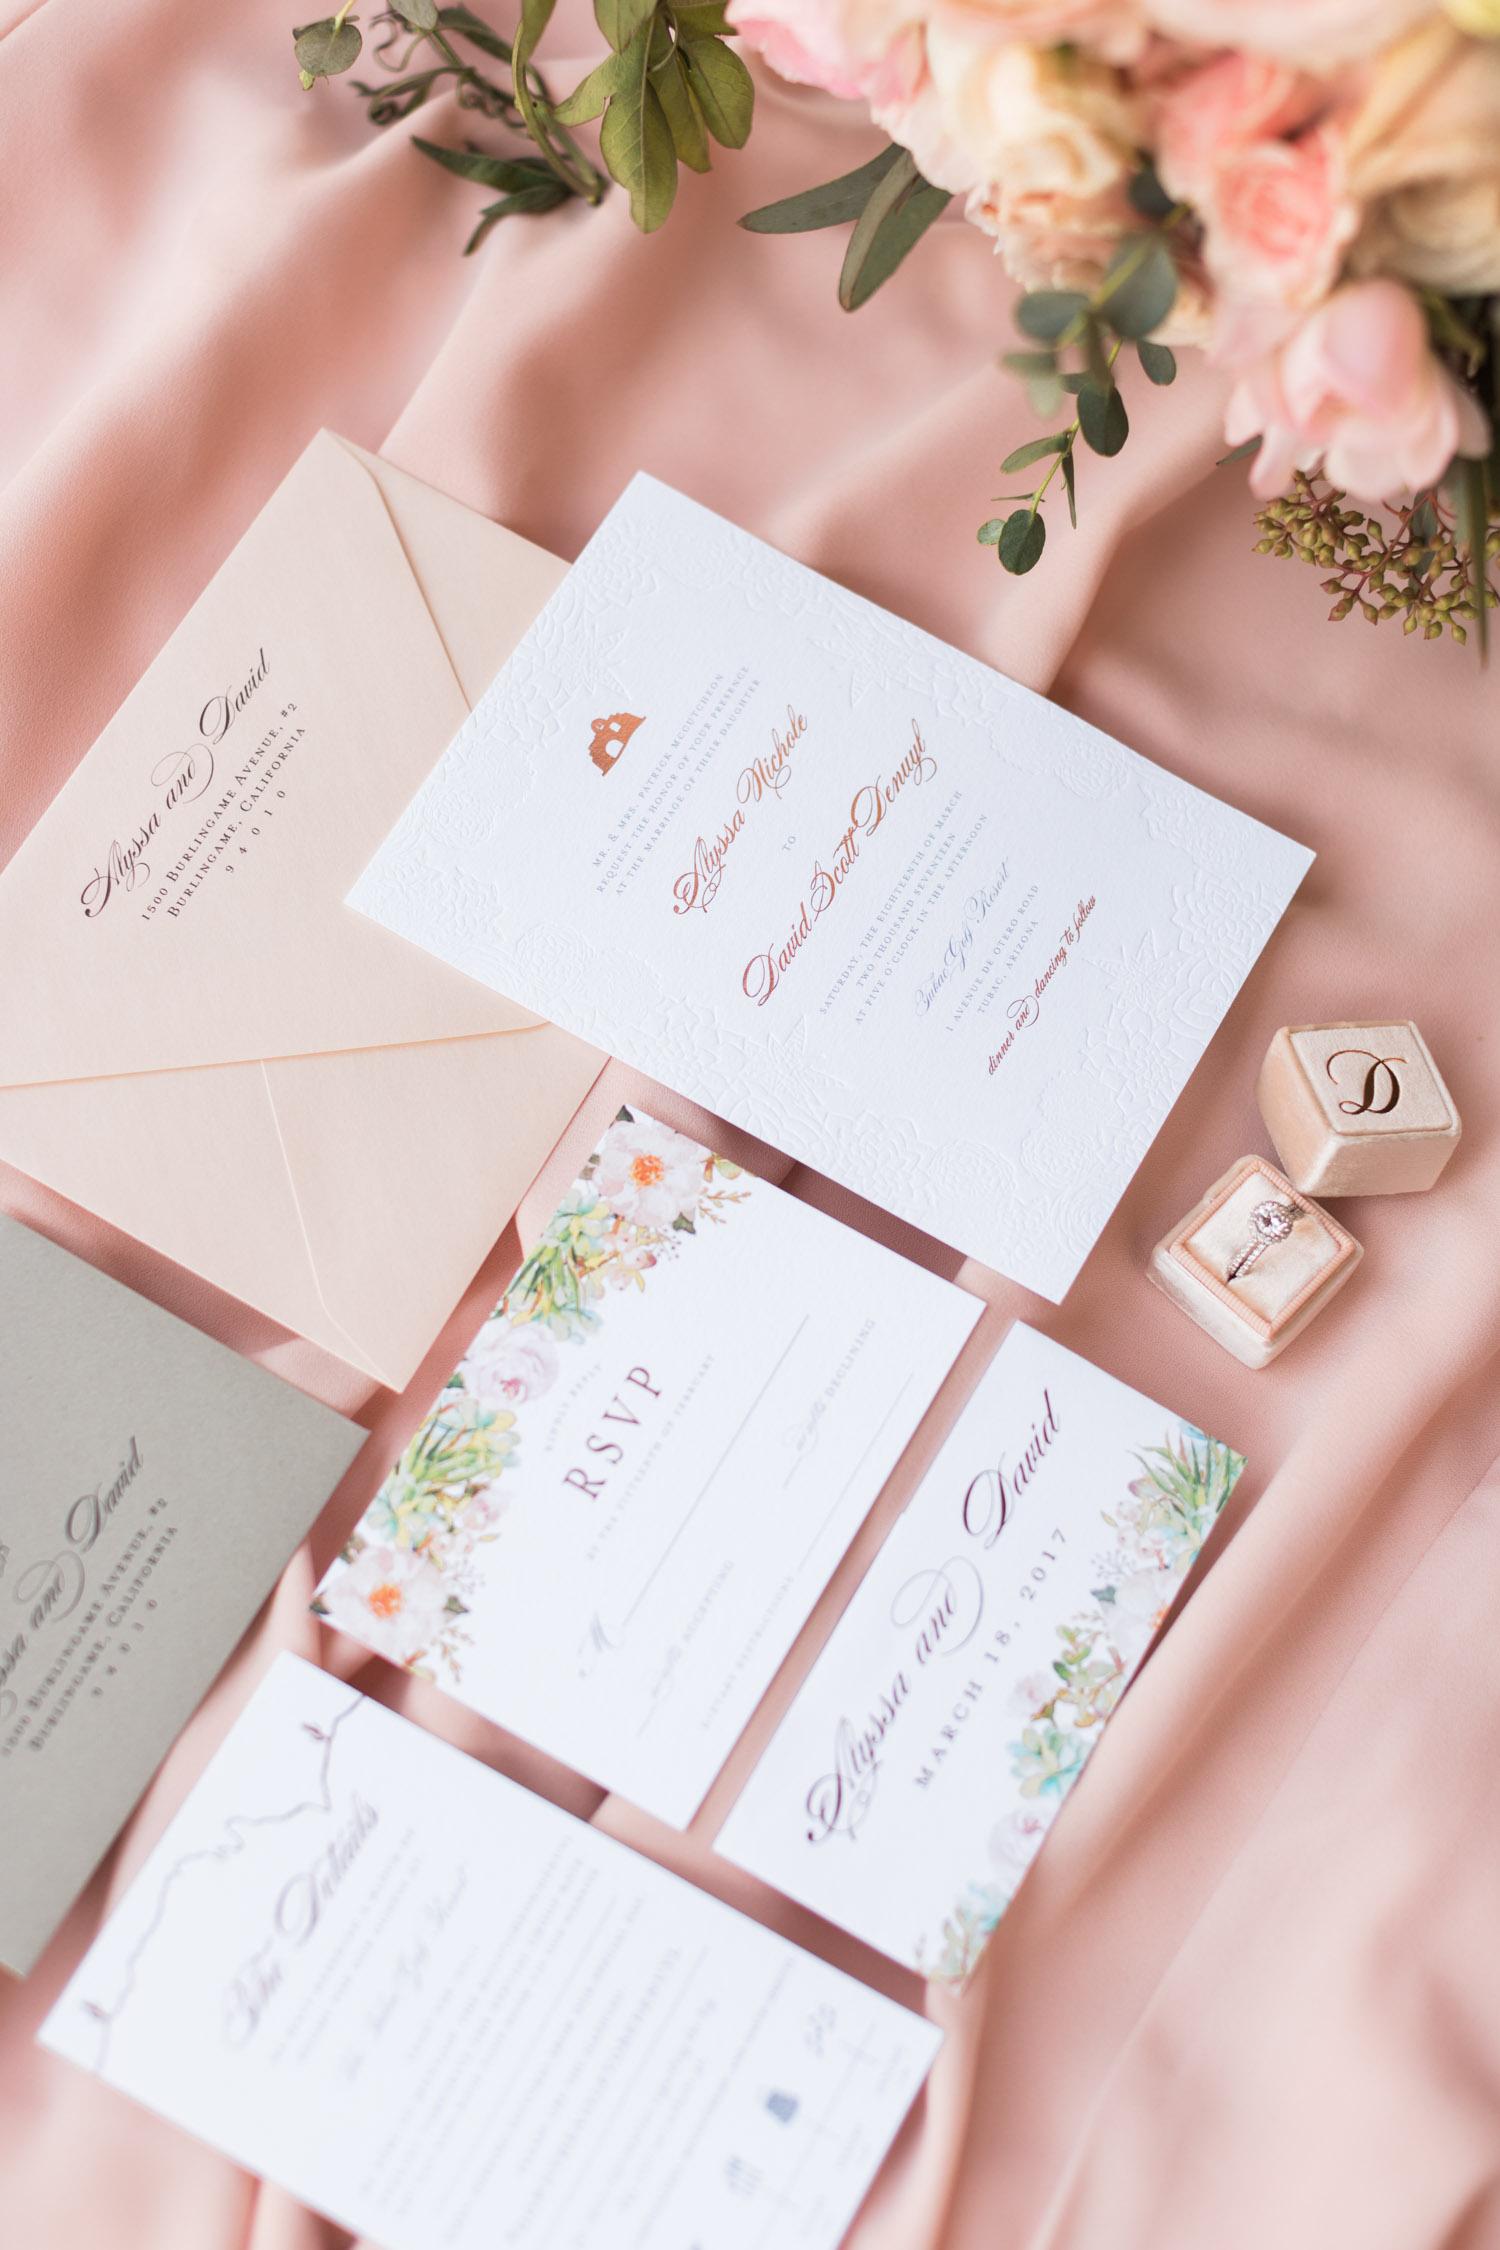 Stunning desert wedding invitations designed by Brie Dumais Designs